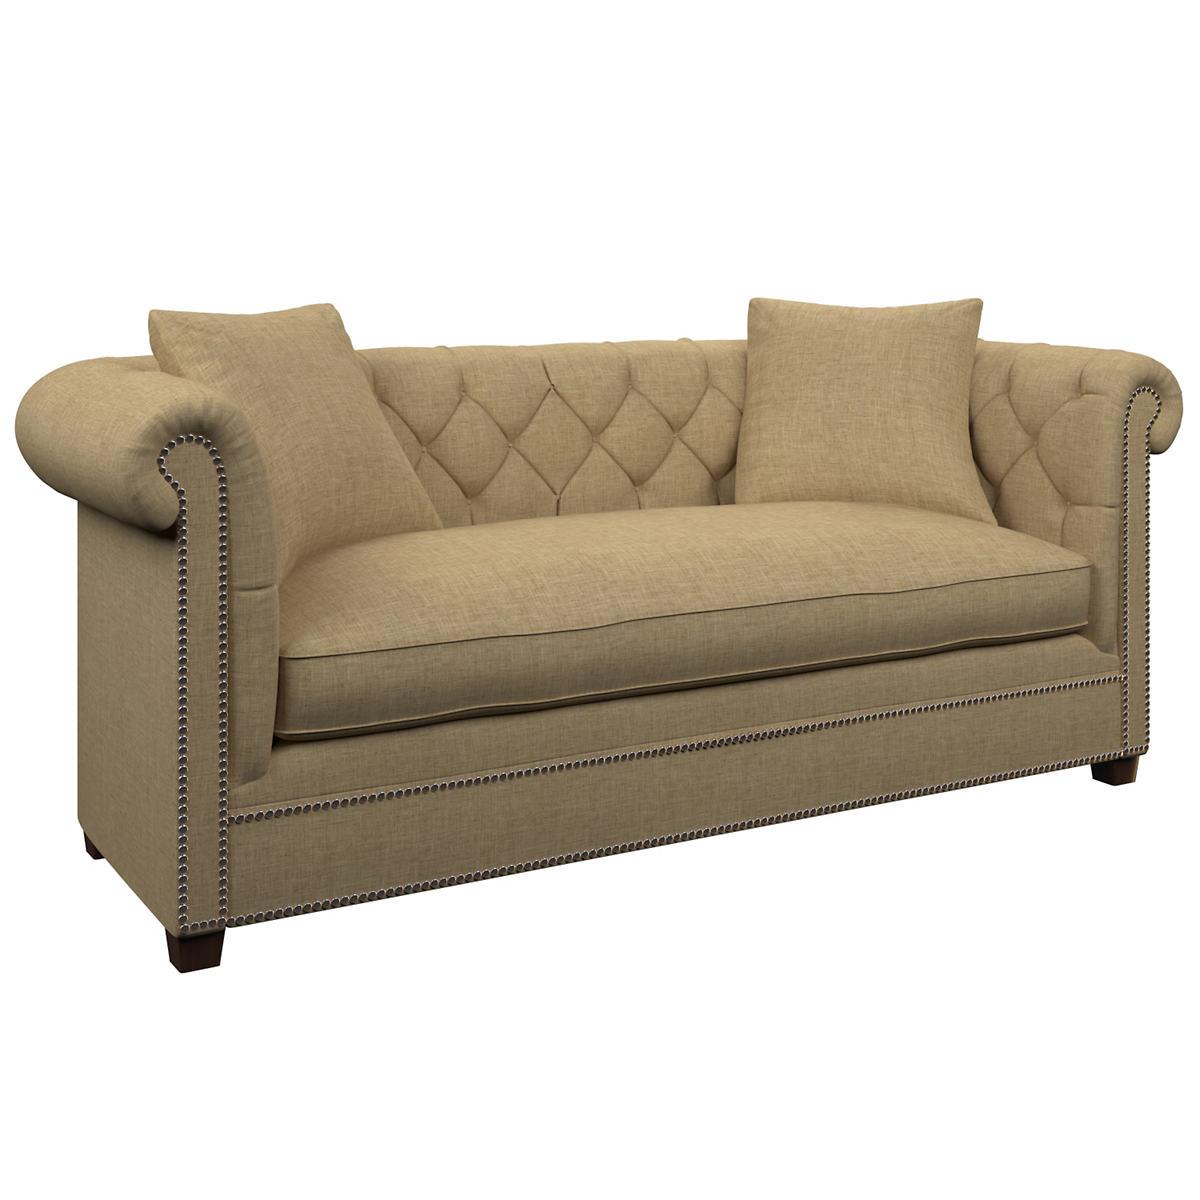 Greylock Natural Richmond Sofa